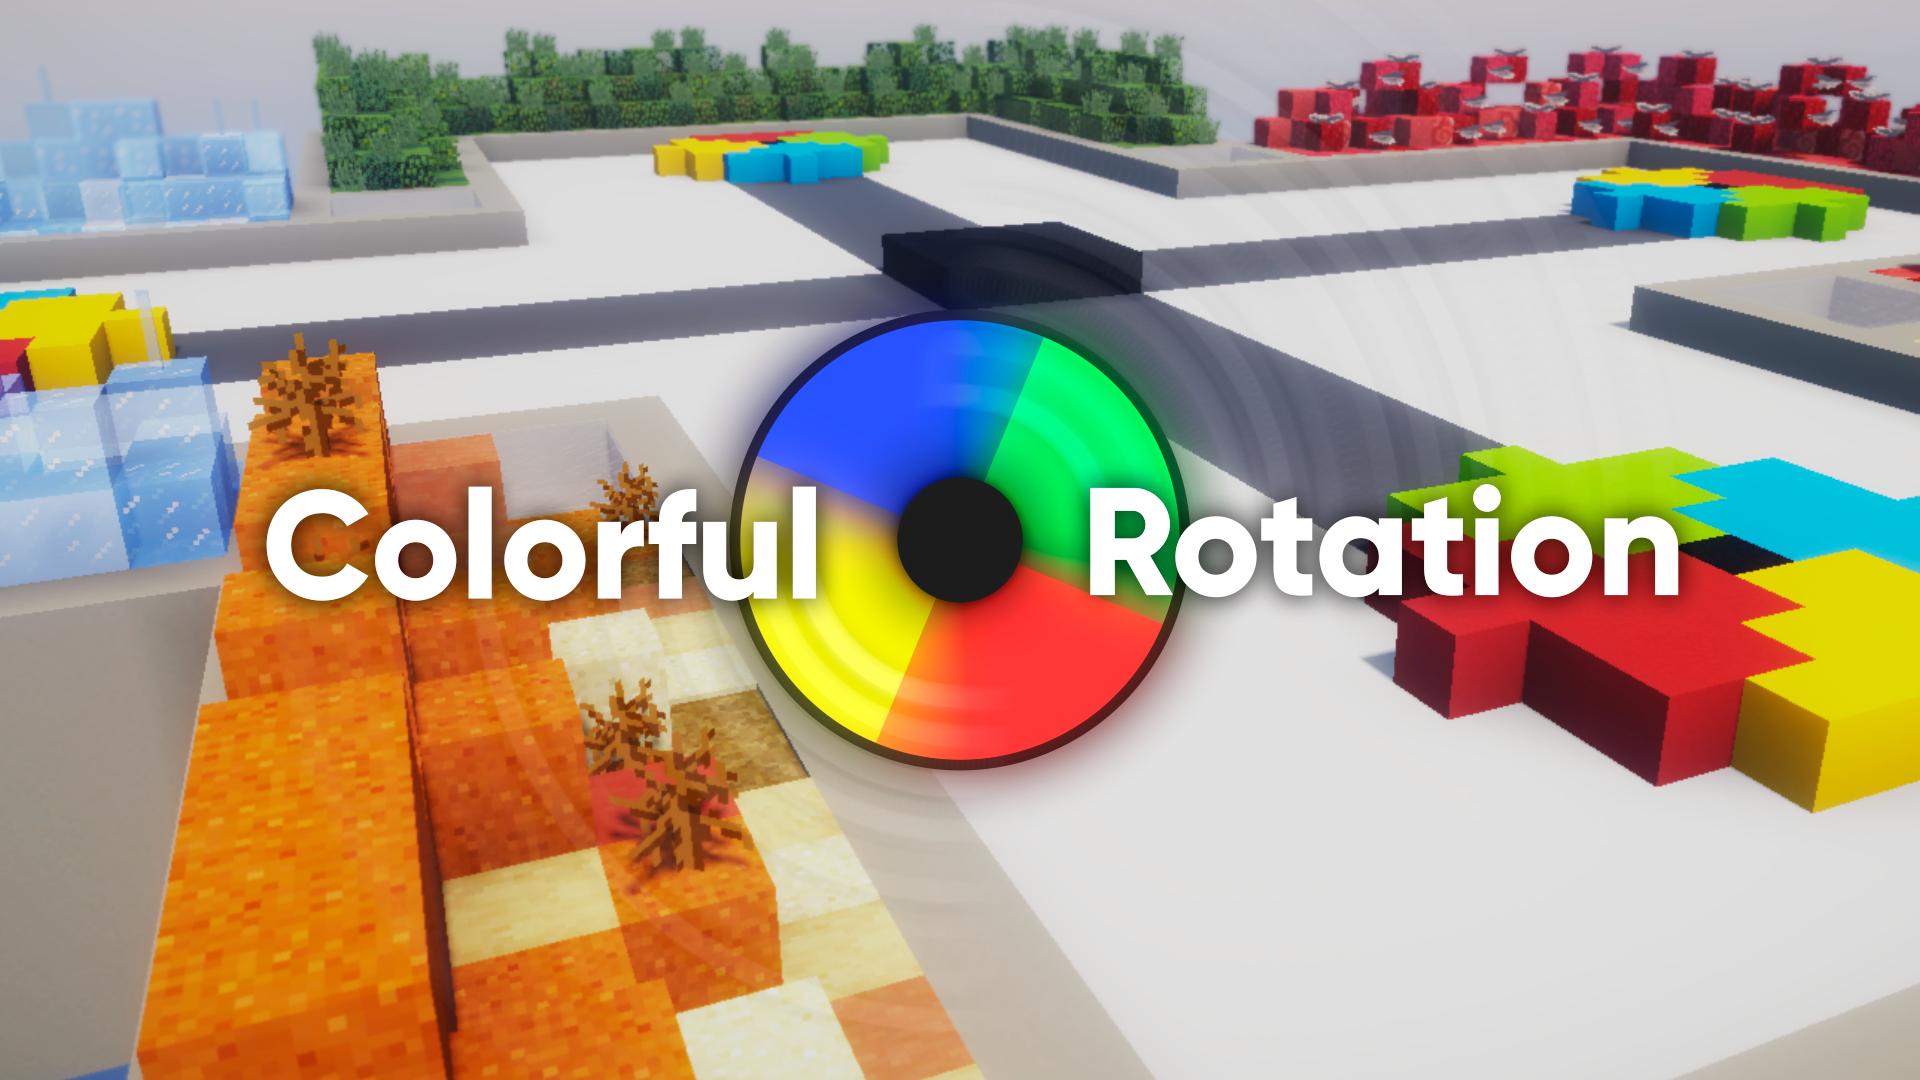 Colorful Rotation